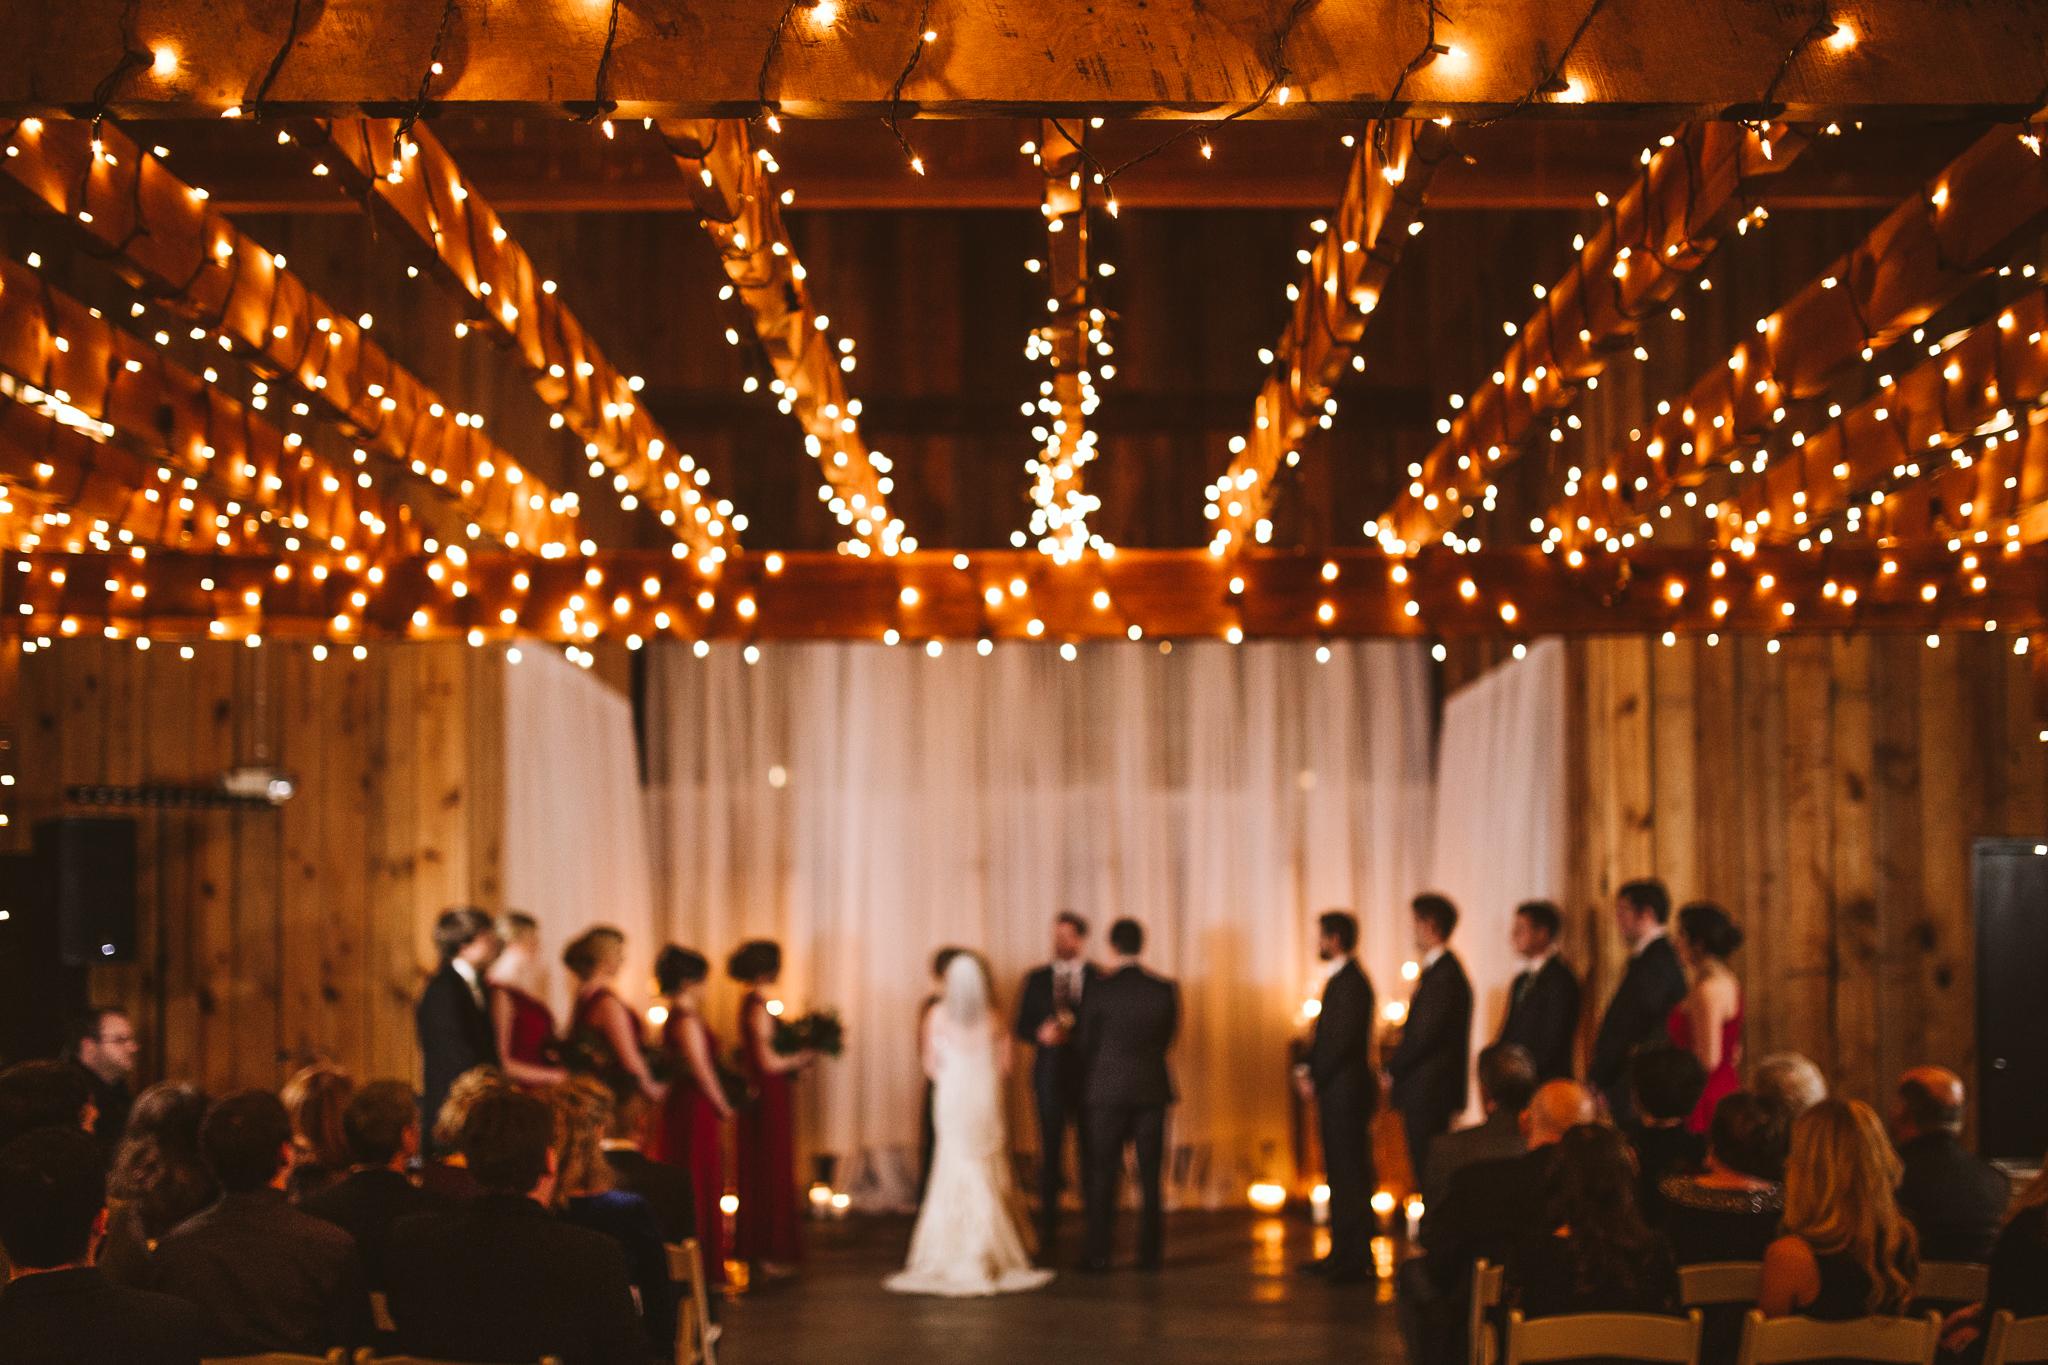 0121 Ariana Jordan Photo - Cameron & Lauren's Wedding at Talon Winery  7032.jpg